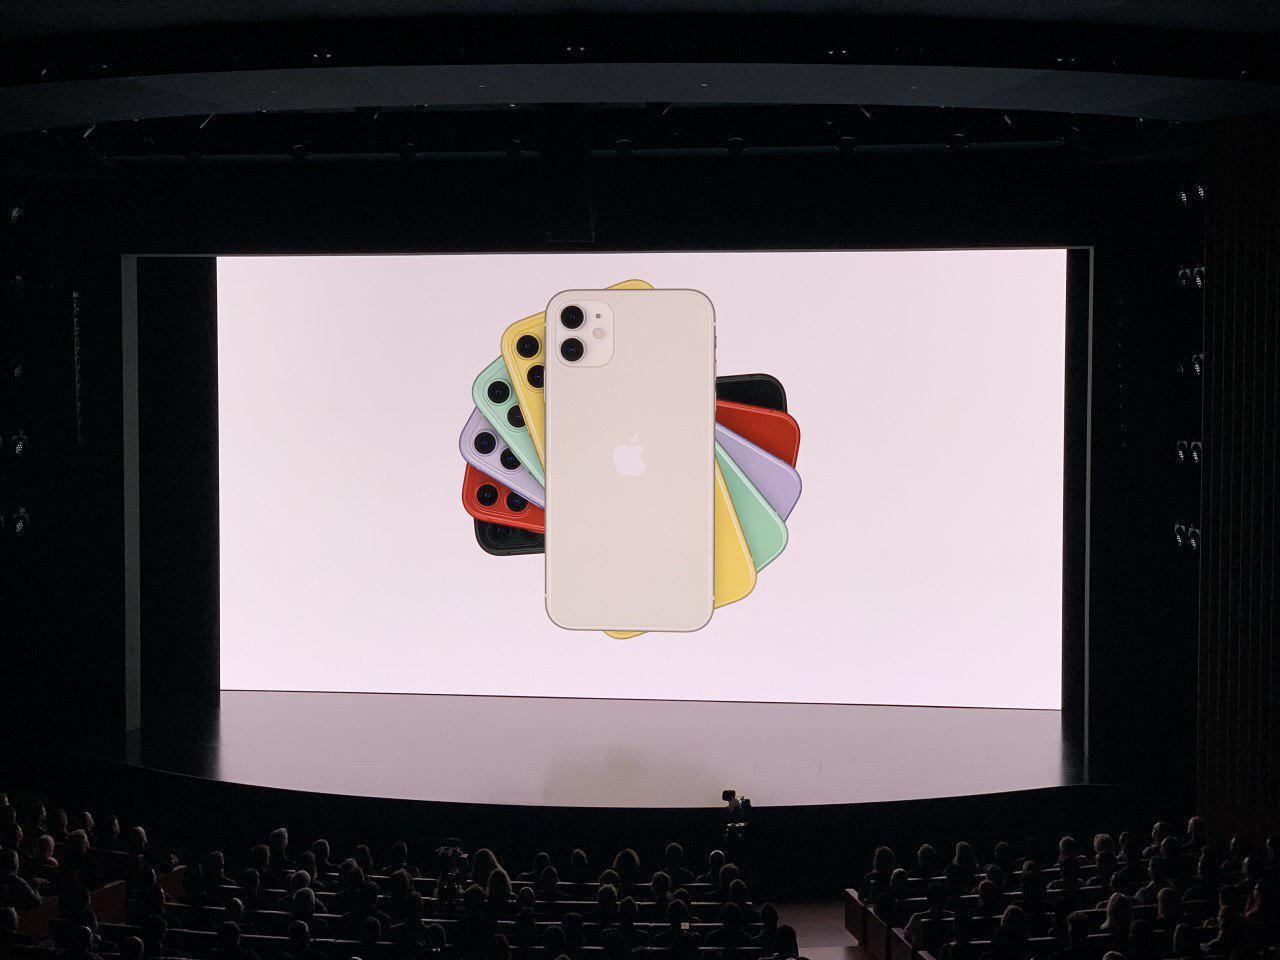 🍏 Apple показала нові iPhone 11, iPhone 11 Pro, iPhone 11 Pro Max, а також лівий берег Києва